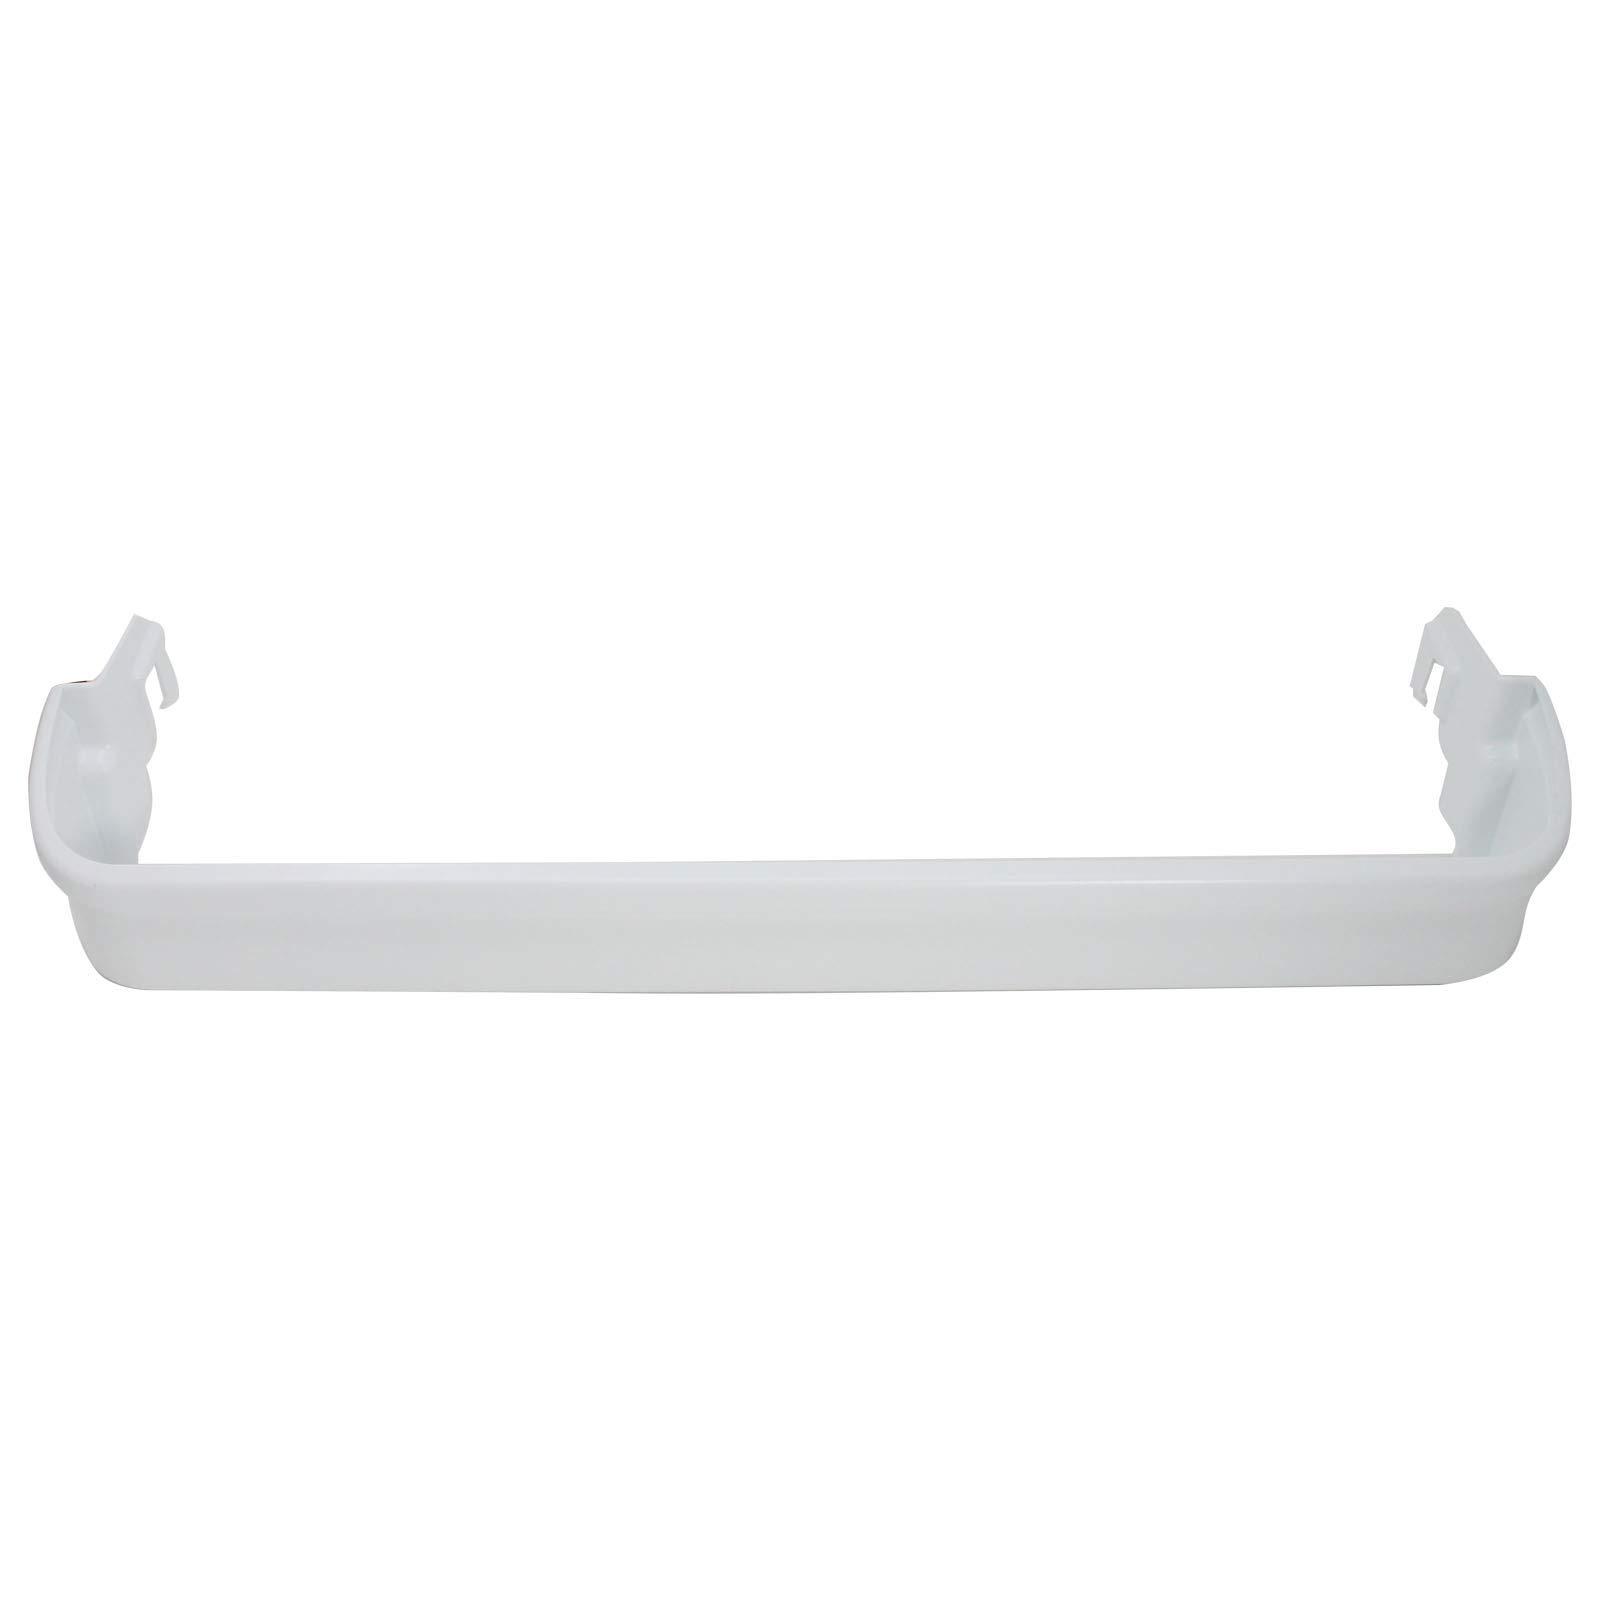 "Details about  /Frigidaire Refrigerator Freezer Section Door Shelf 20 5//8/""  Part # 218763612"